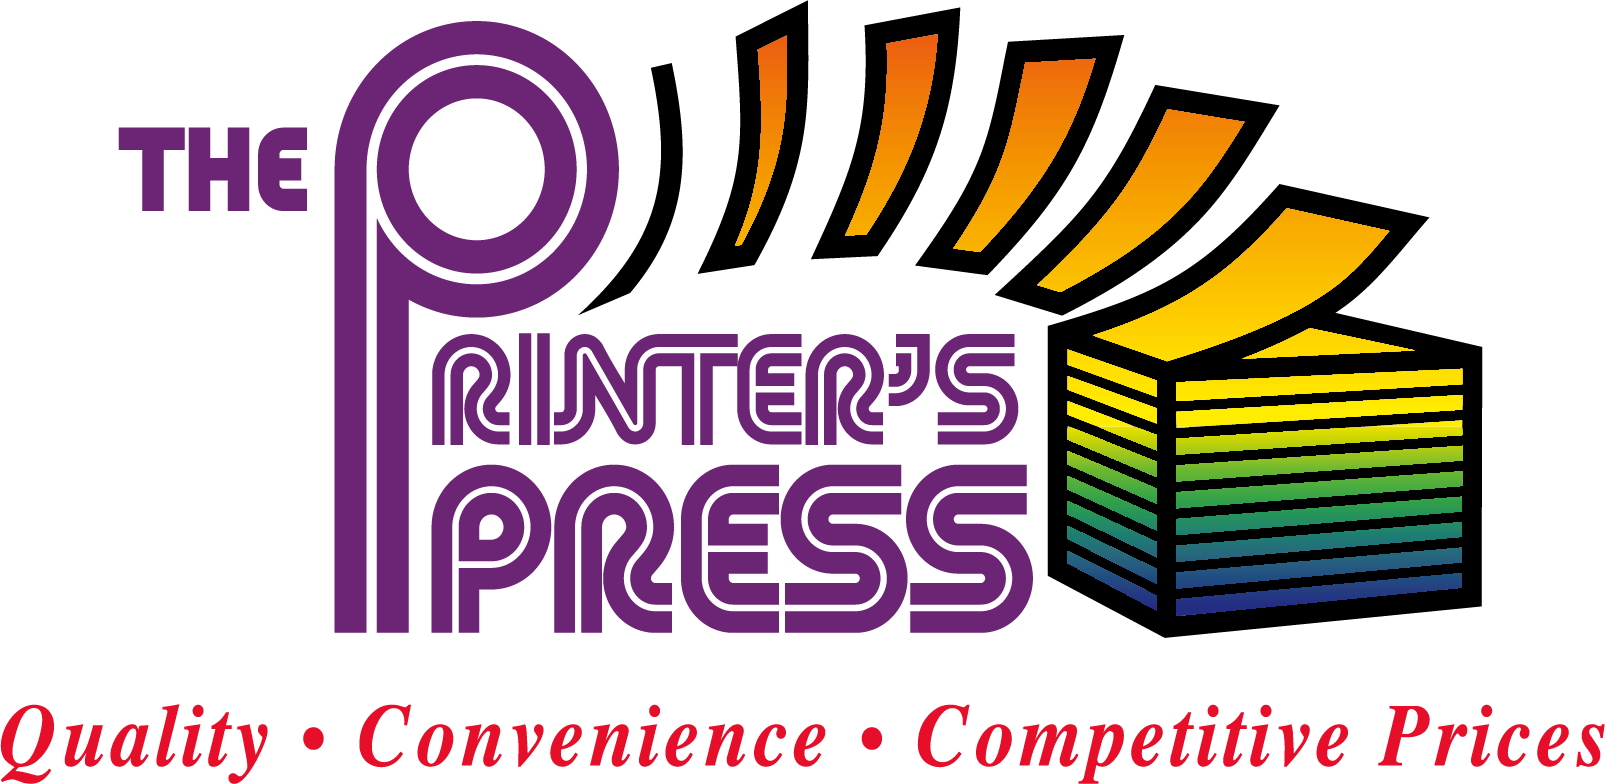 PrintersPresswith tag.png